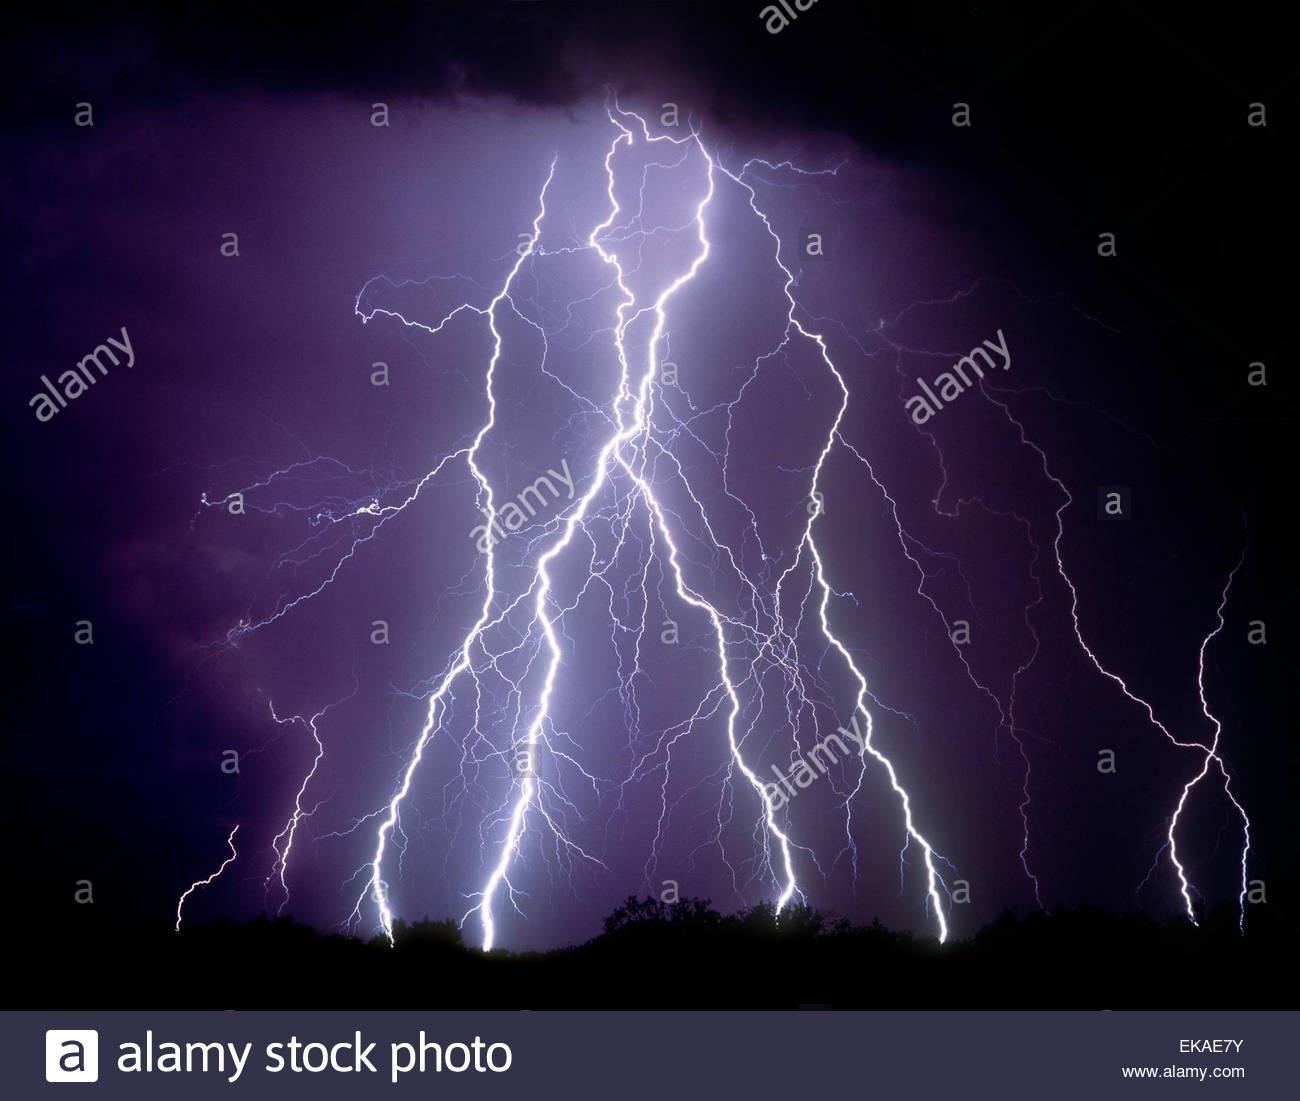 Lightning strikes in the desert north of Tucson Arizona in a summer monsoon type thunderstorm. Stock Photo